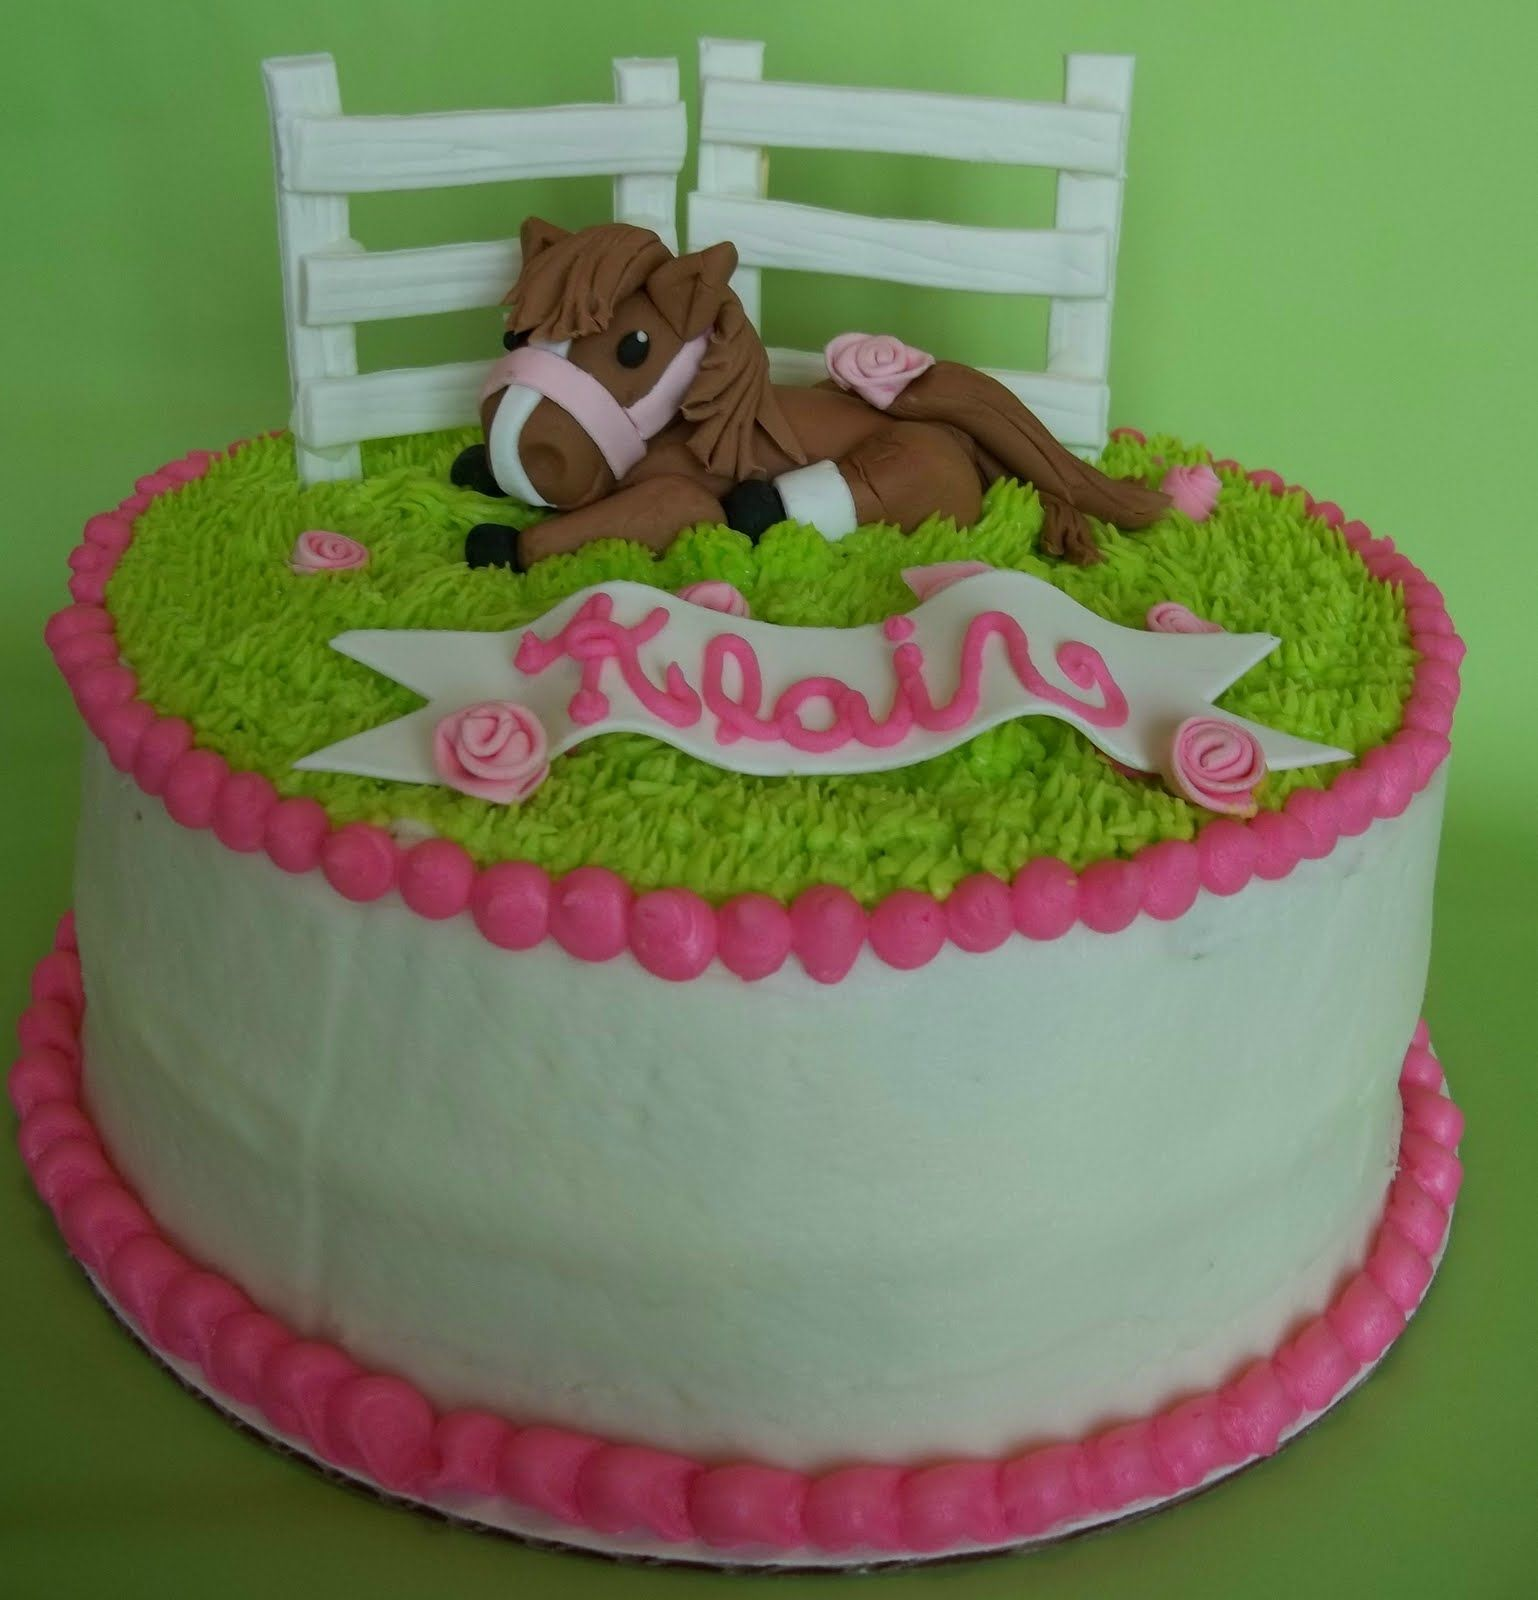 Zebra Themed Cake Turned Horse Sale Horse Cake Horse Birthday